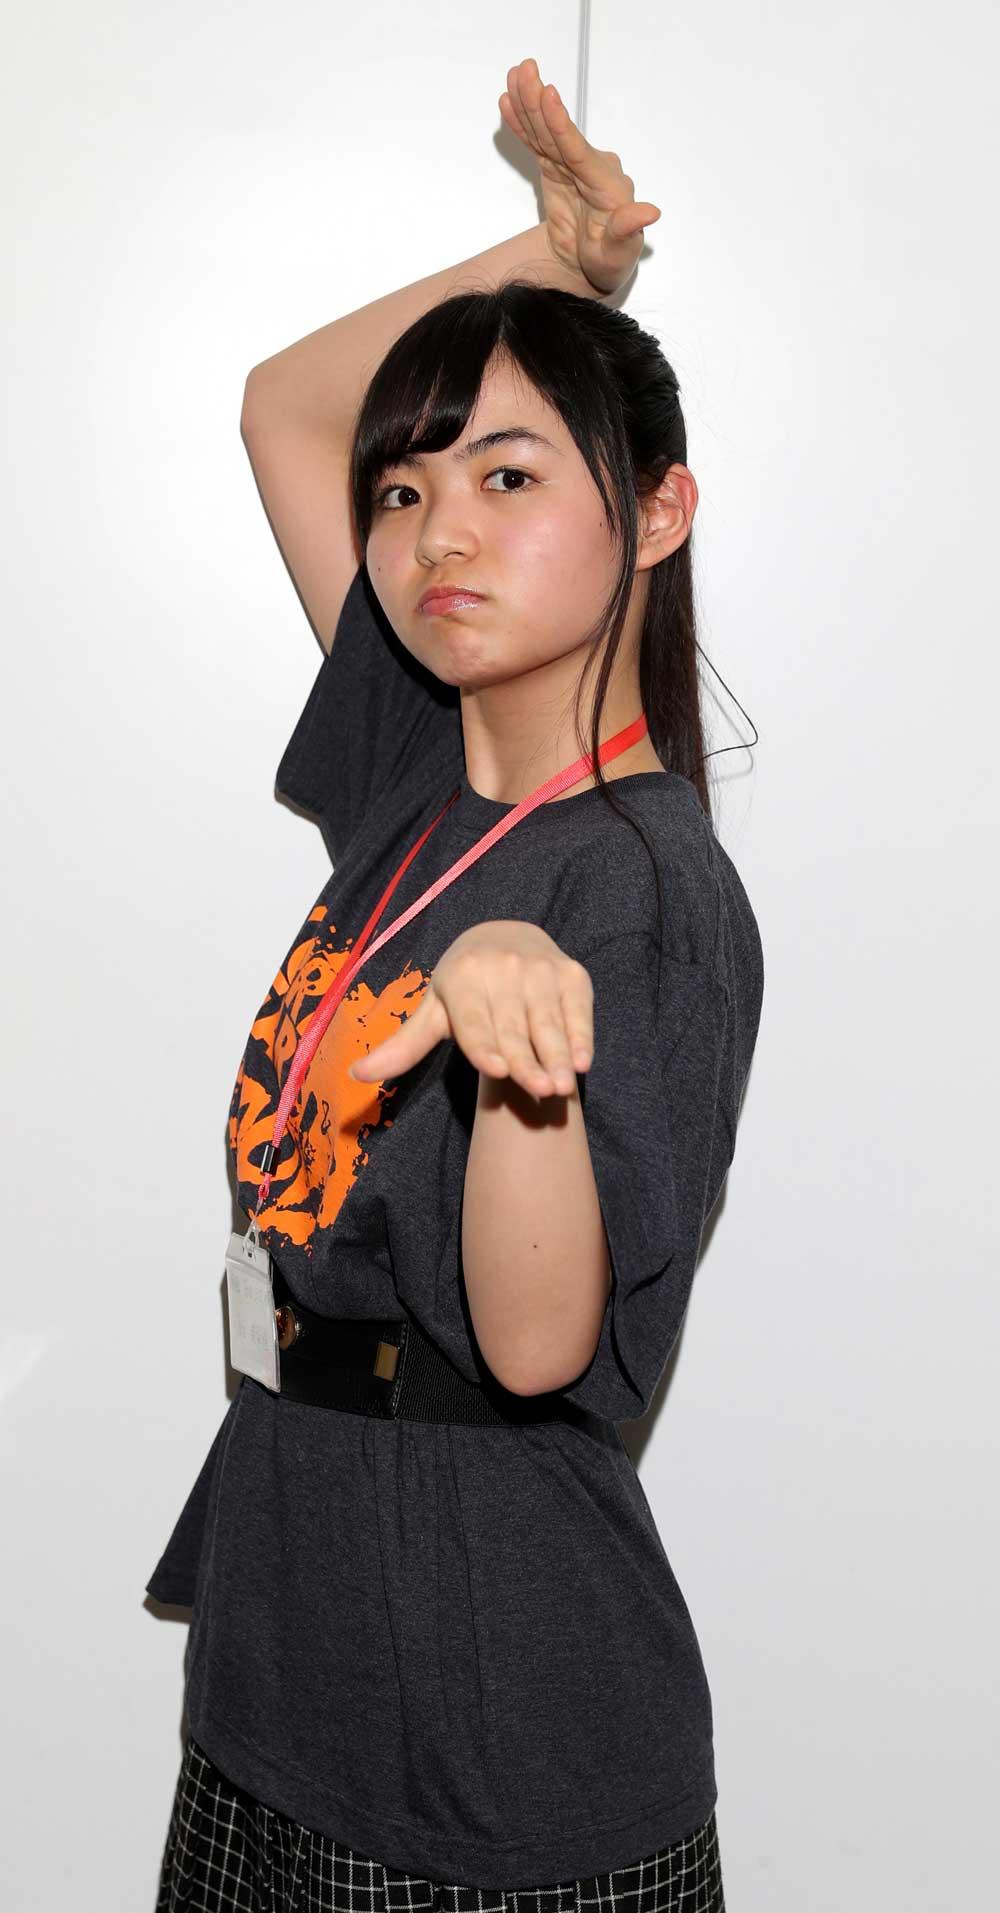 Images : 8番目の画像 - 「中島明子、原田瑛梨佳/舞台に咲く、可憐な二輪、アリスインプロジェクトの最新舞台「降臨Hearts&Soul」で満開に!」のアルバム - Stereo Sound ONLINE